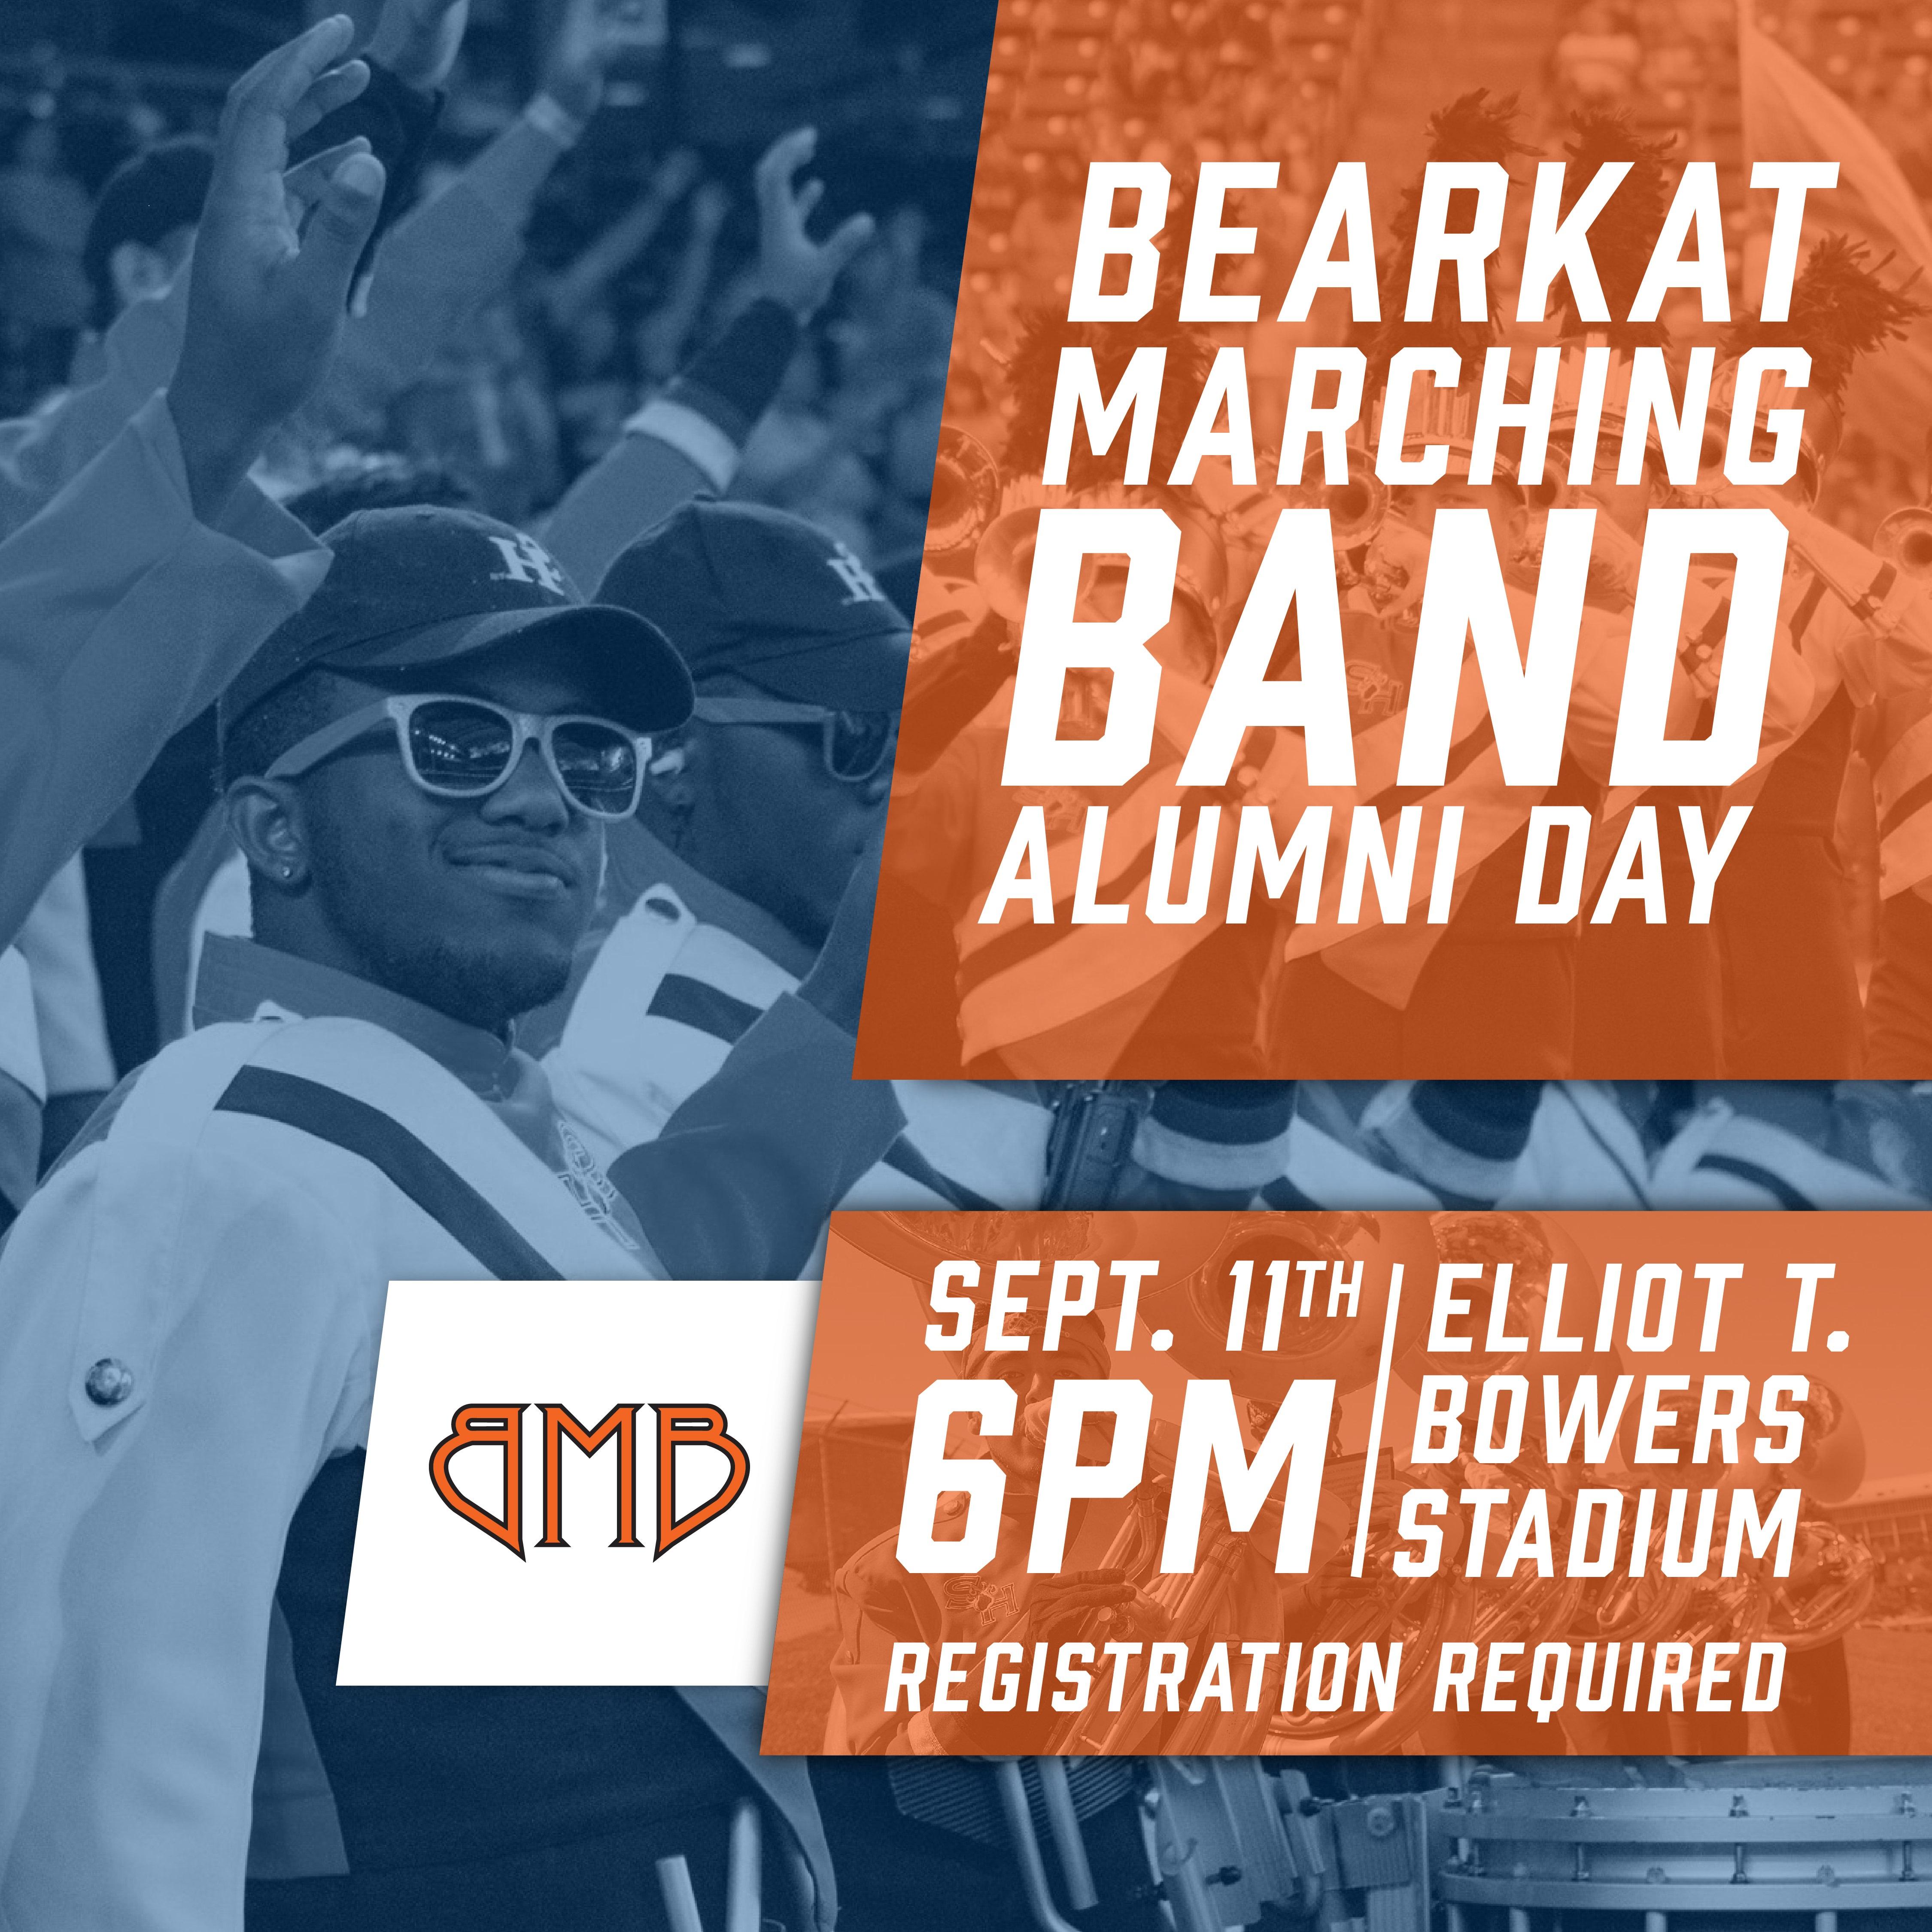 Bearkat Marching Band